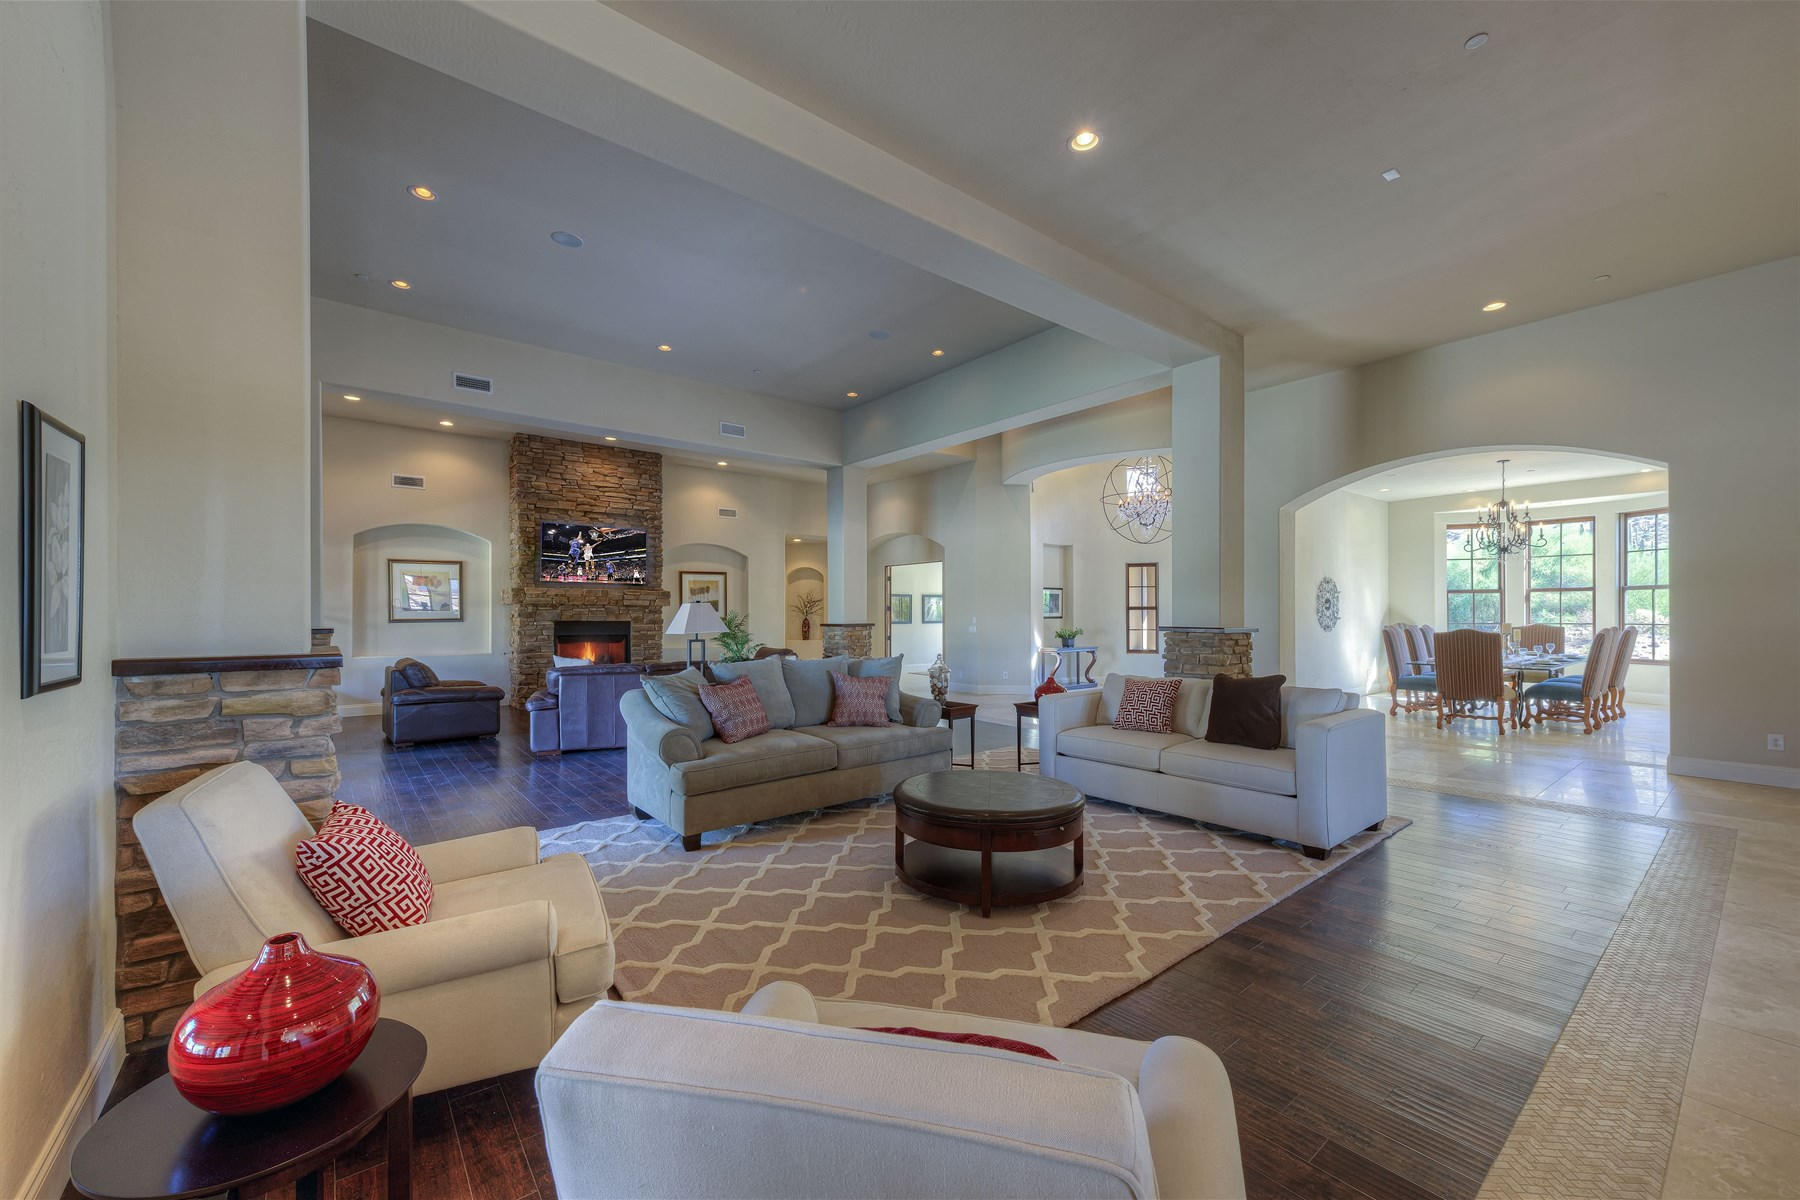 Single Family Home for Sale at Fabulous custom home never-before-lived in 11926 E LA POSADA CIR Scottsdale, Arizona 85255 United States